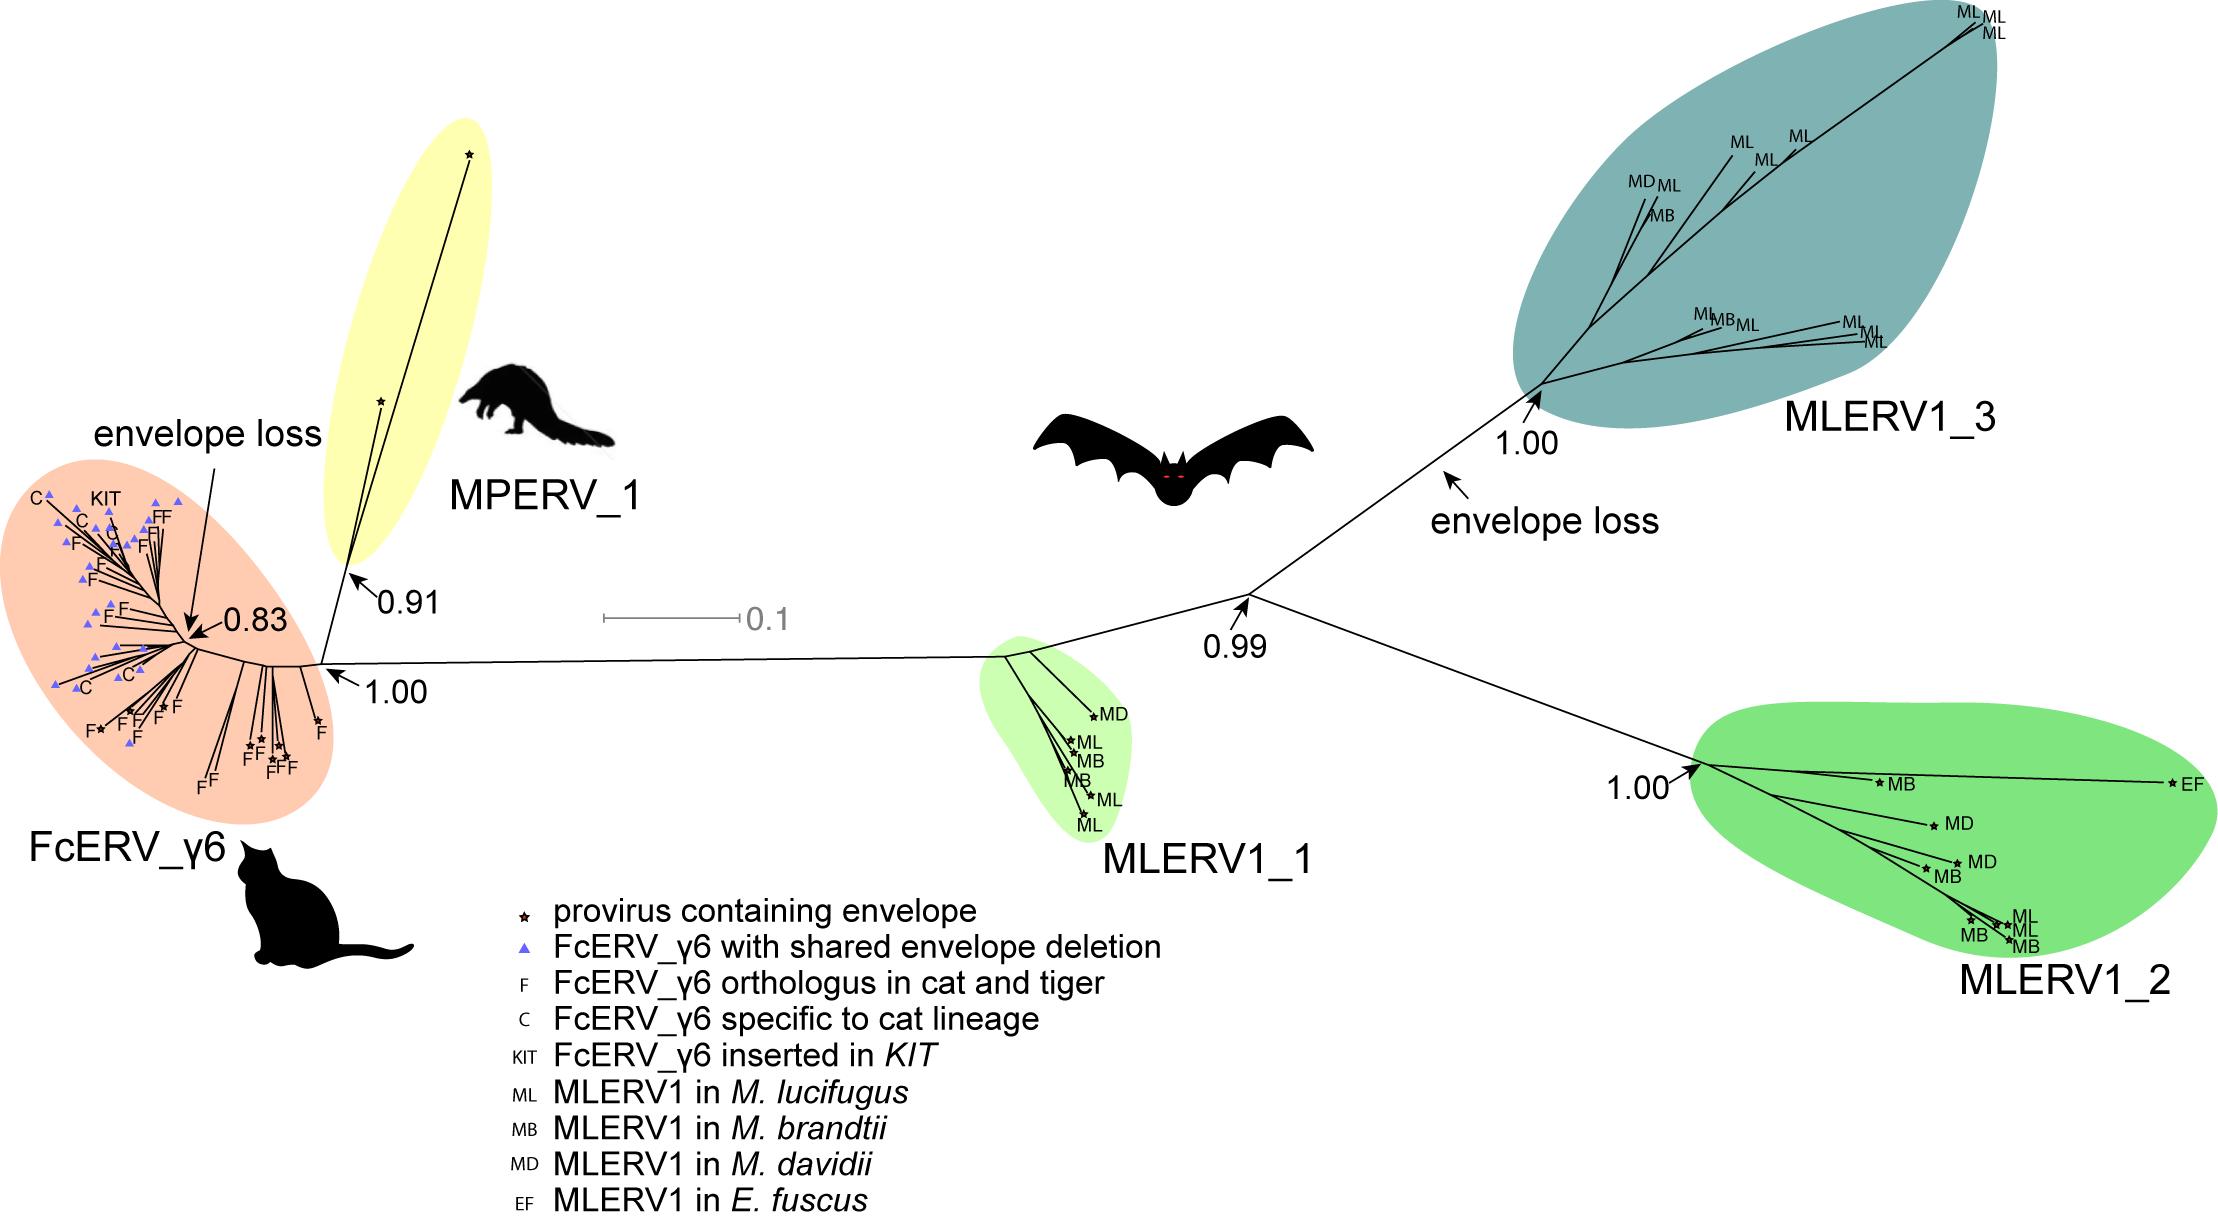 Phylogenetic analysis of MLERV1, FcERV_γ6, MPERV1 families.